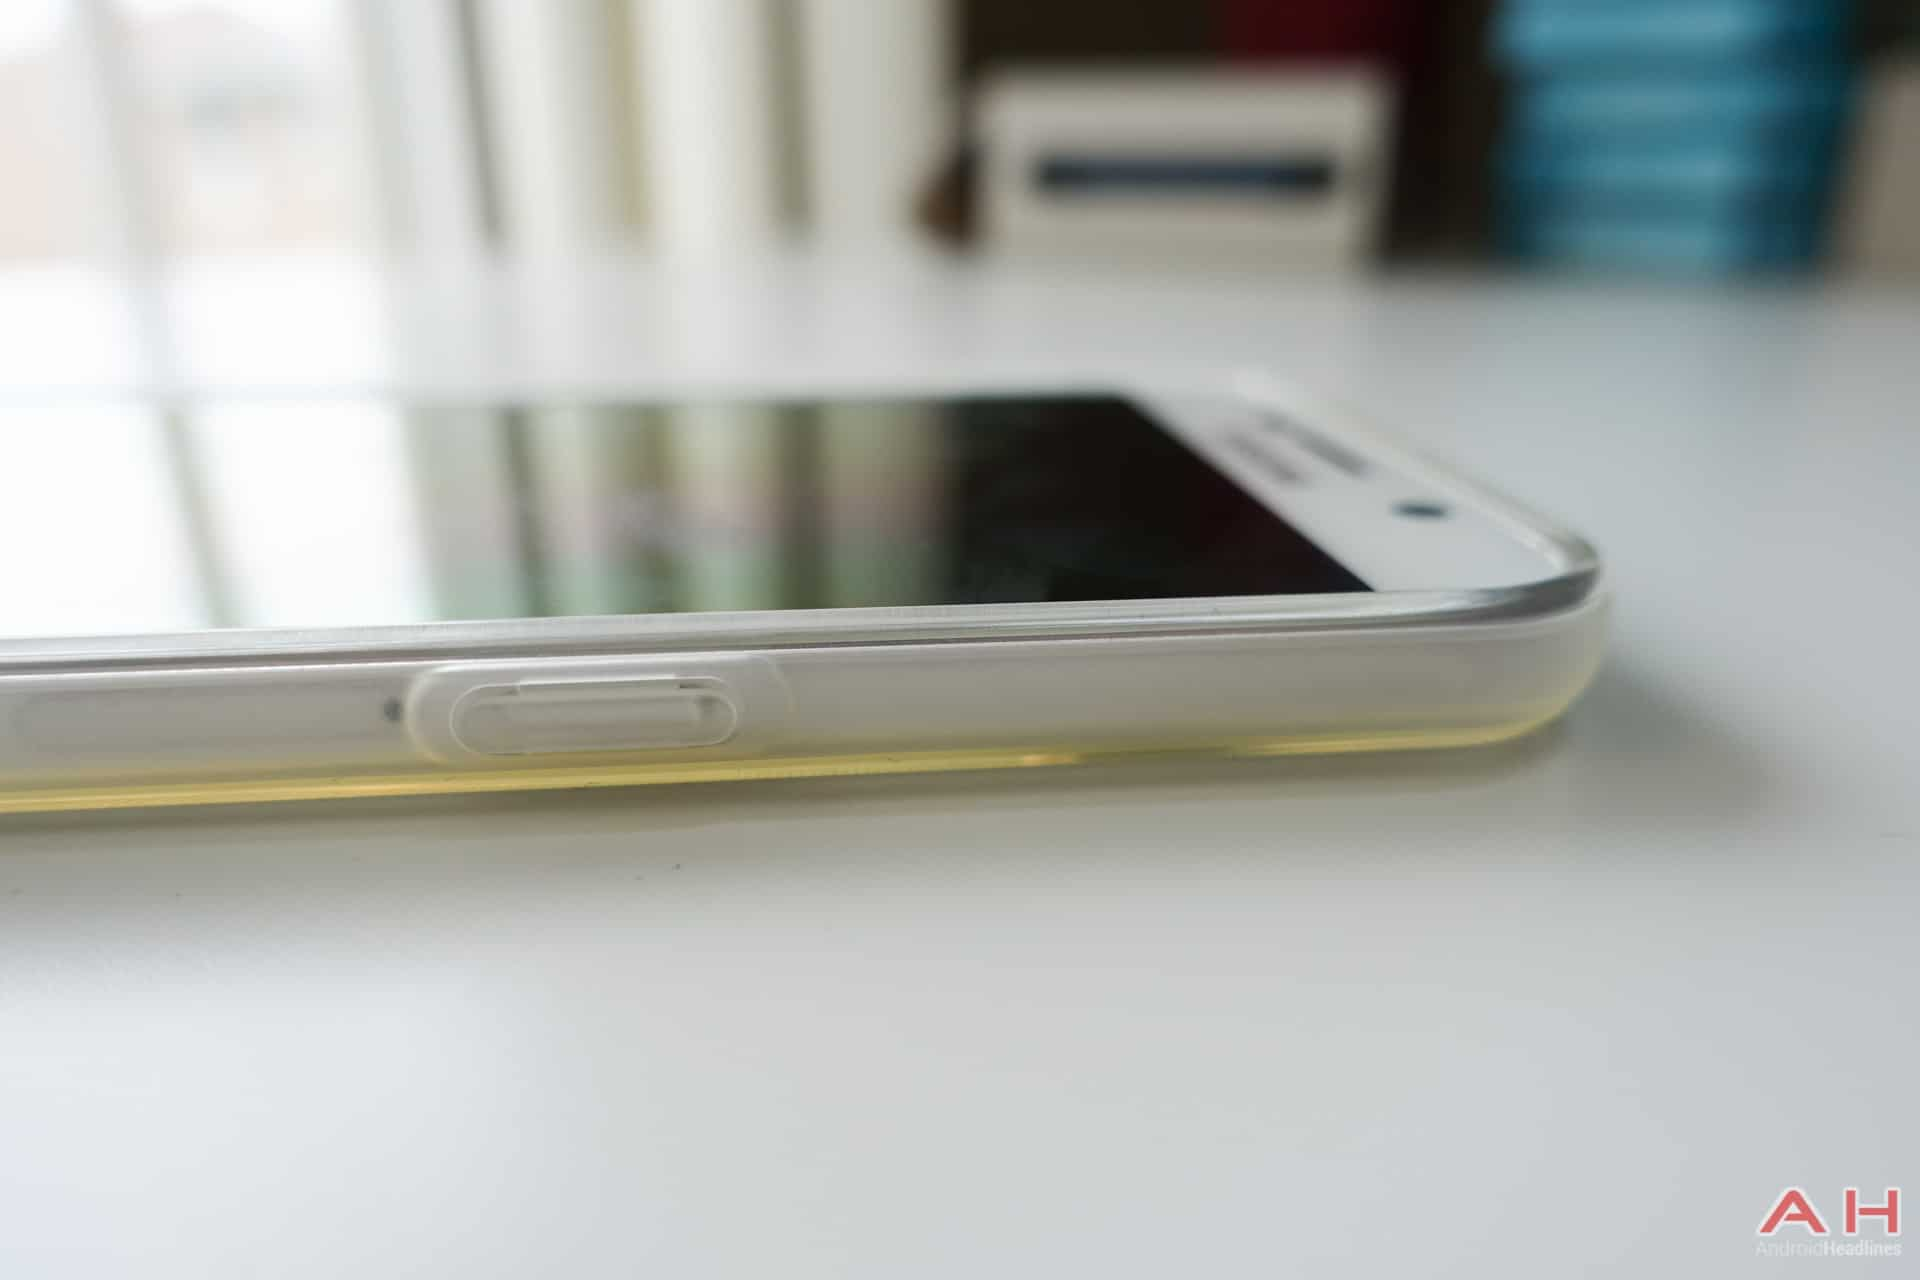 Samsung Galaxy S6 Verus Crystal Light Case AH 6